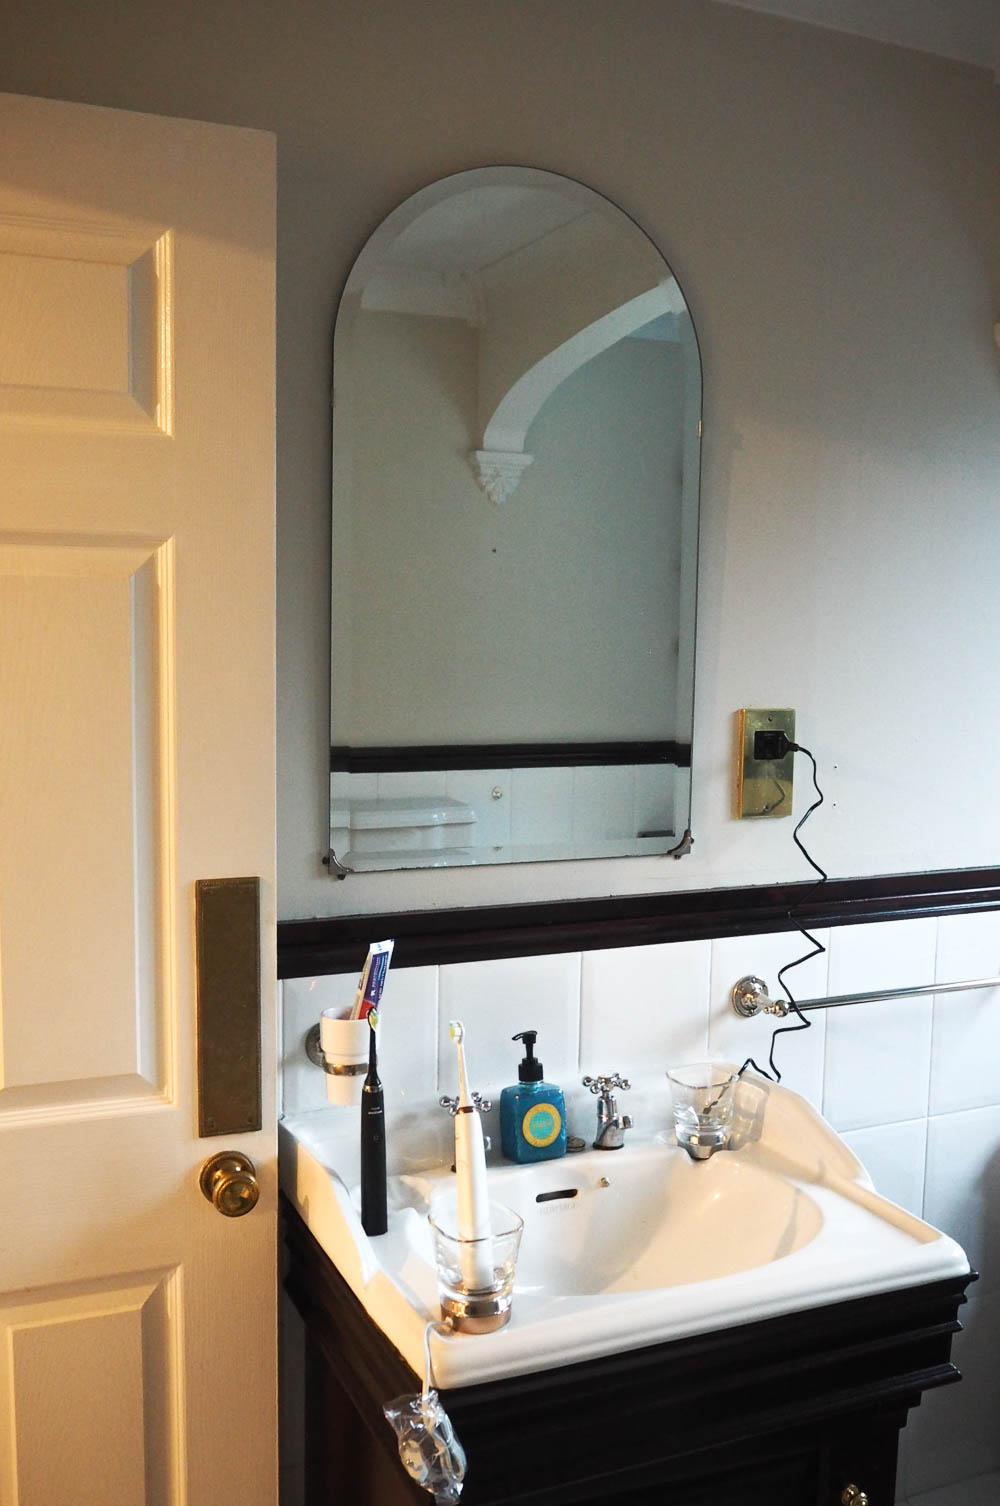 The Ikea Godmorgon Bathroom Mirror Cabinet Melissa Jane Lee